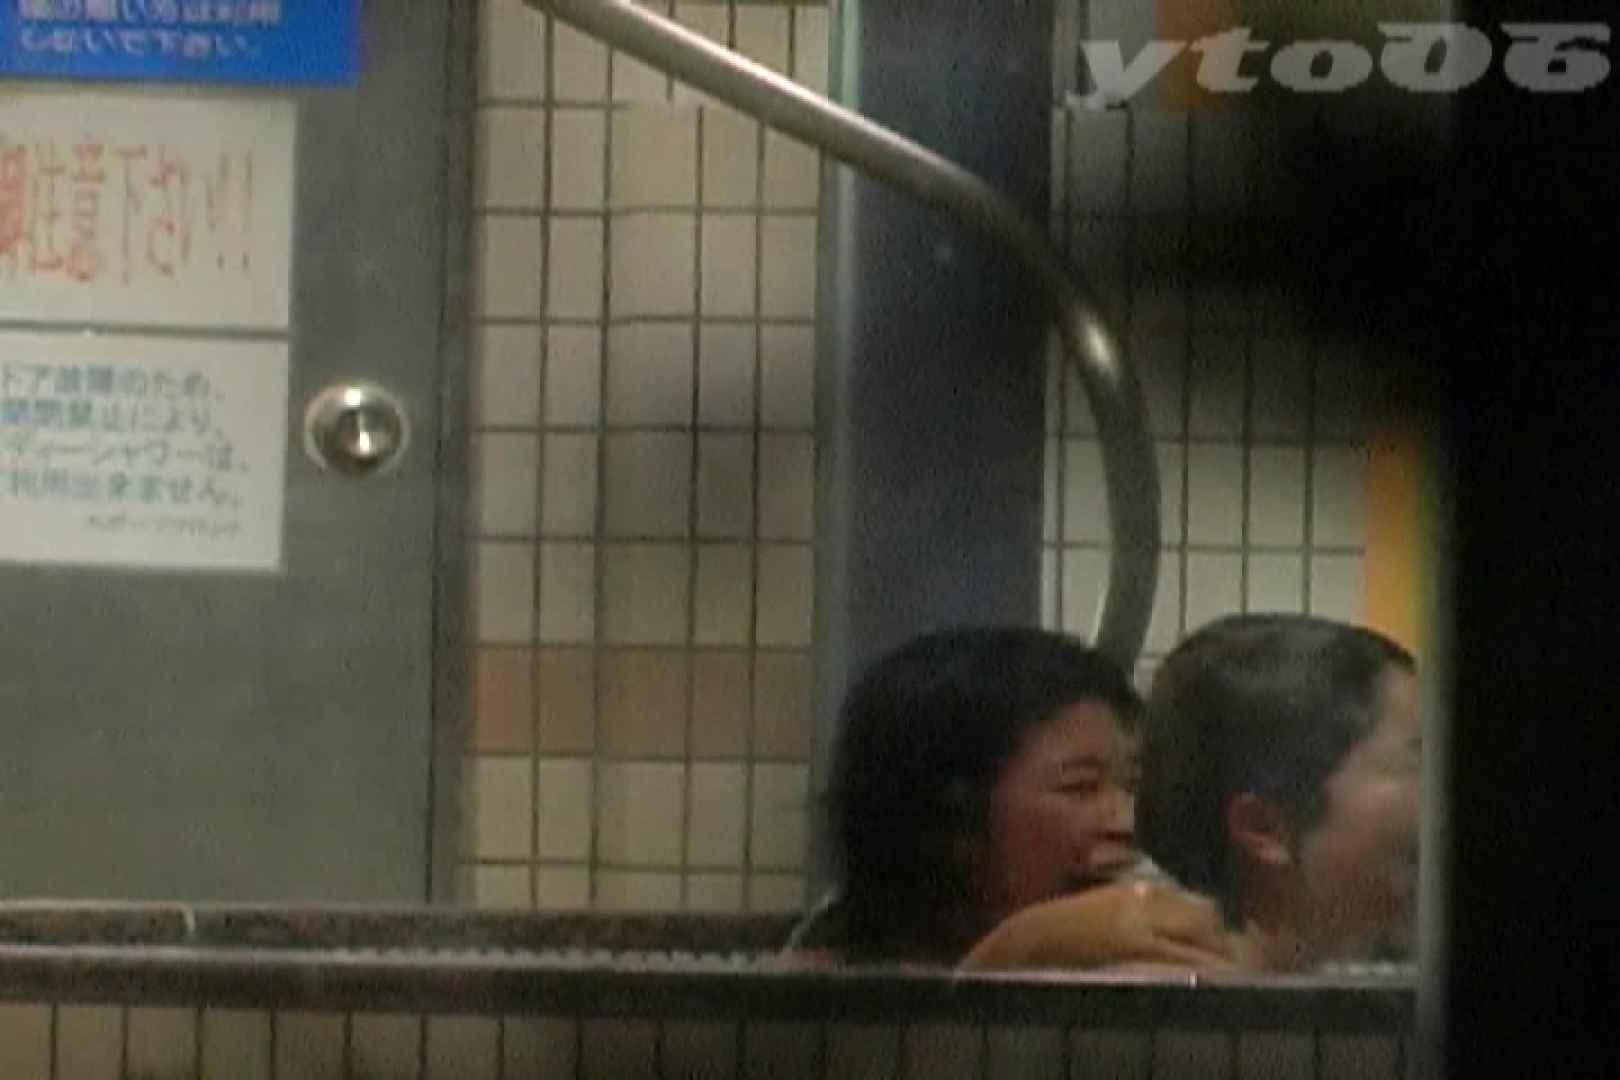 ▲復活限定▲合宿ホテル女風呂盗撮 Vol.34 合宿 AV無料 94画像 15